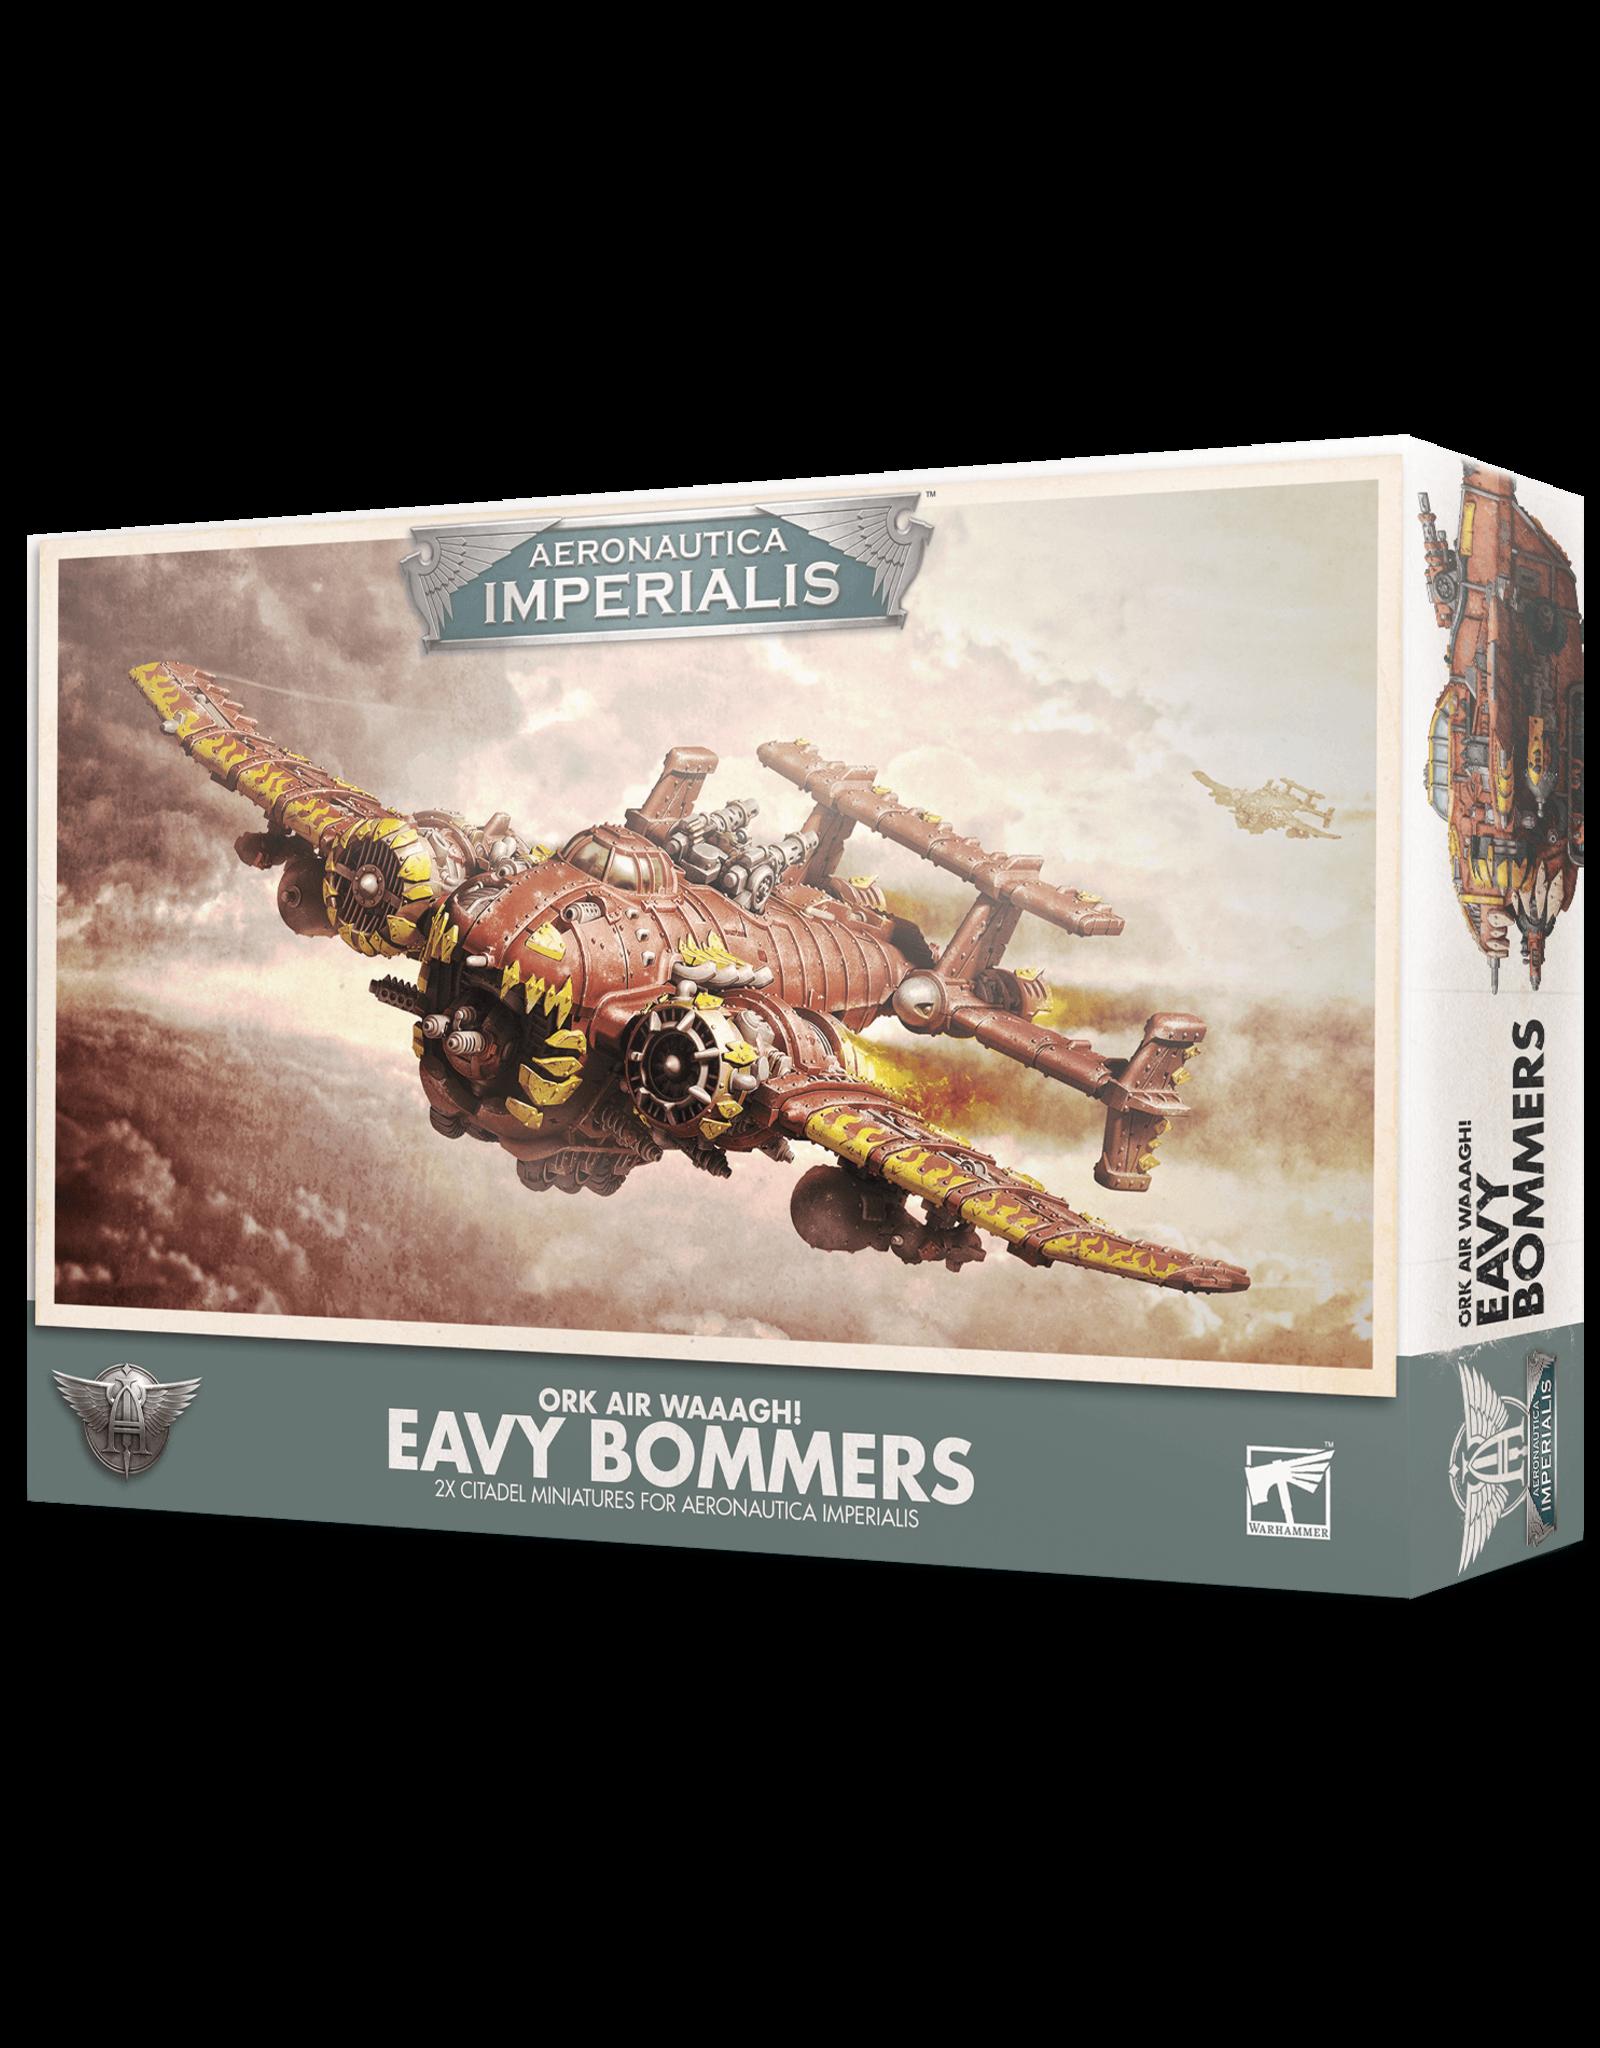 Aeronautica Imperialis Aeronautica Imperialis: Ork Air Waaagh! 'Eavy Bommerz